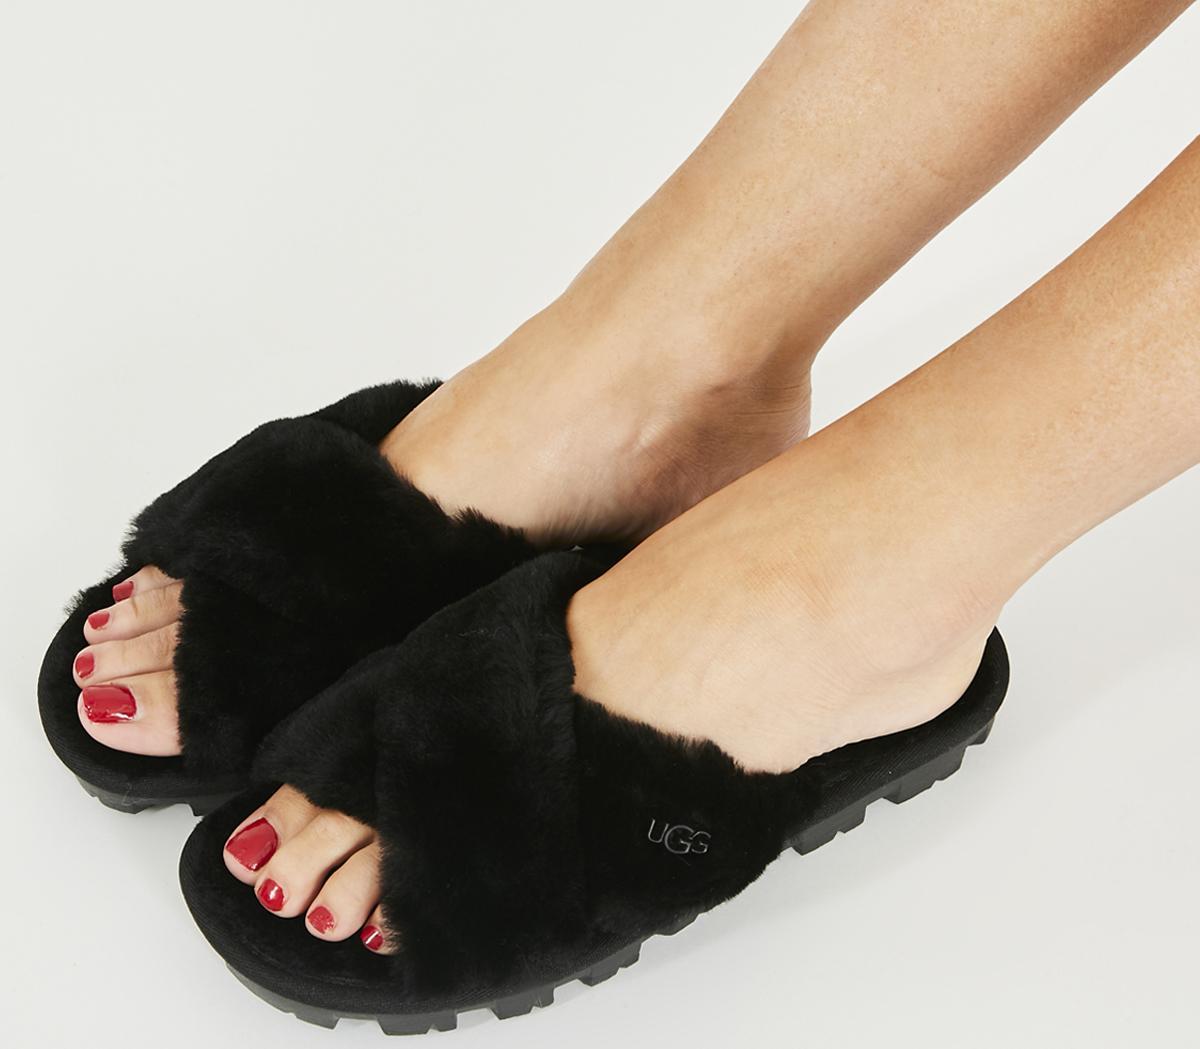 UGG Fuzzette Slippers Black - Flats